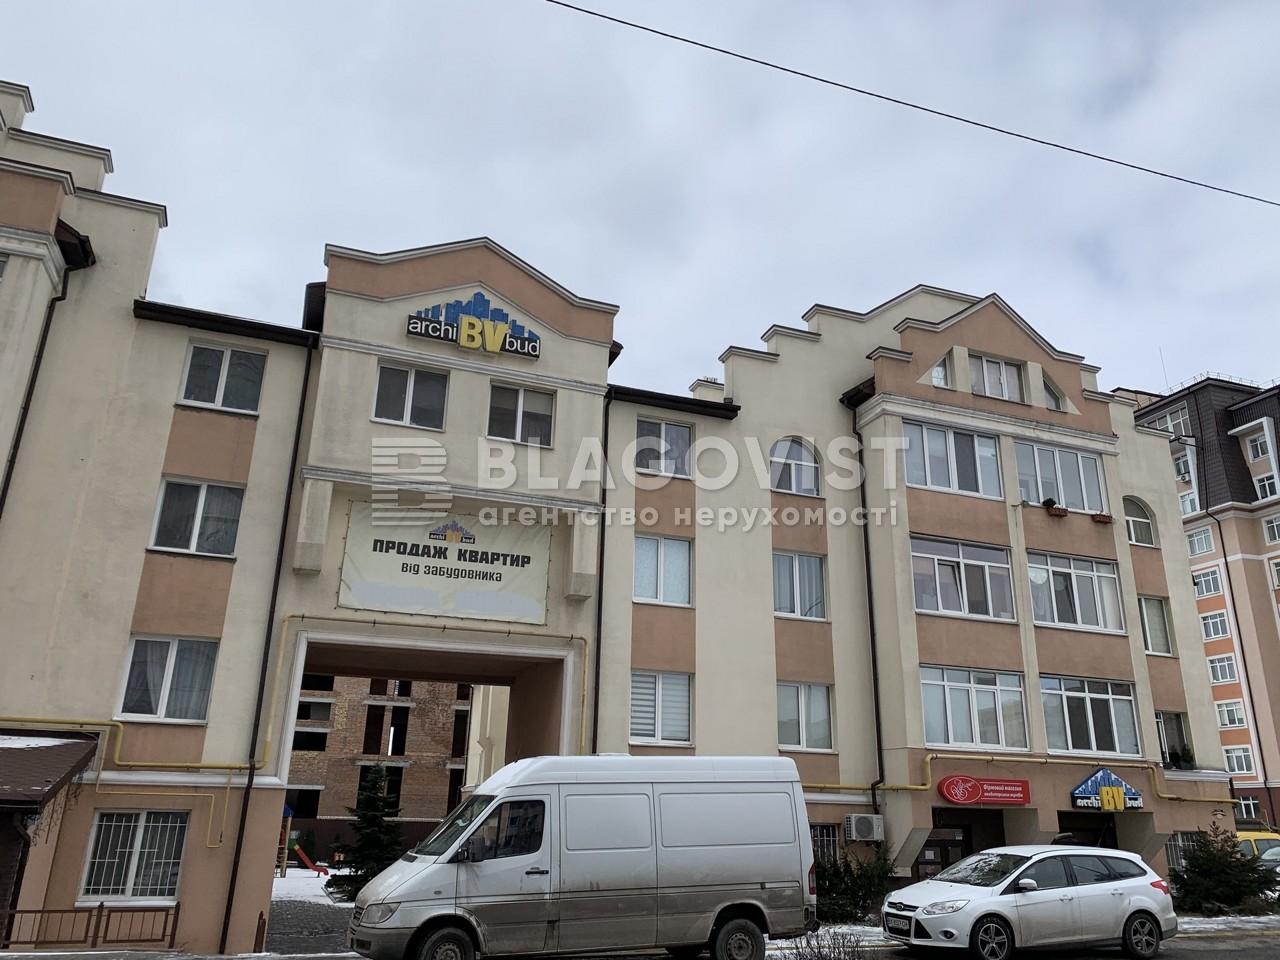 Квартира F-44641, Хмельницкого Б. бульв., 15-17, Буча (город) - Фото 3